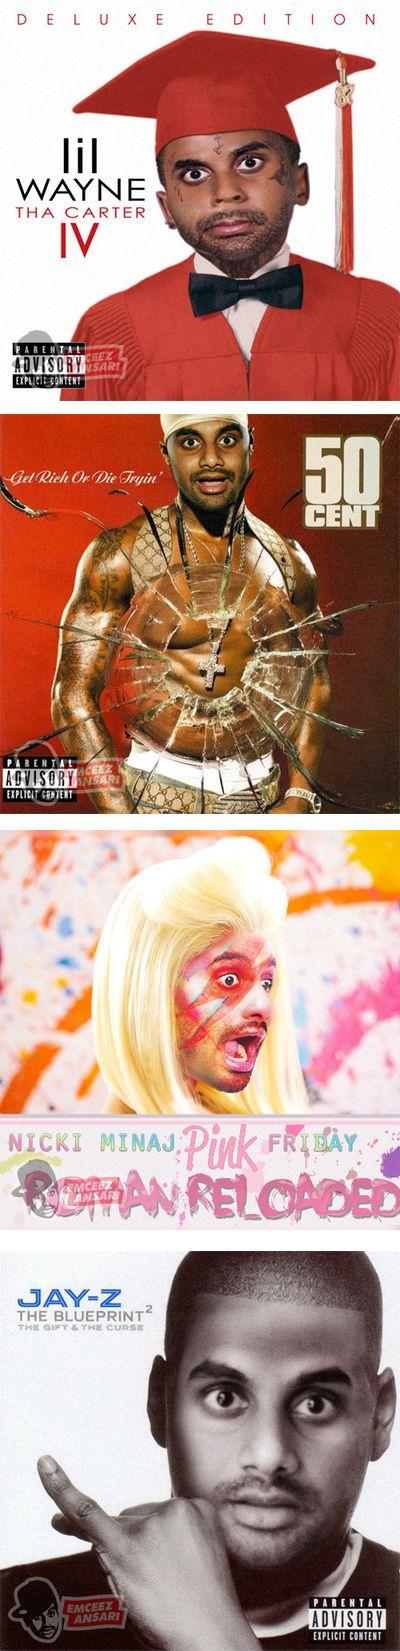 Aziz Ansari Hip-Hop Album Covers Mash-Ups. I like how he incorporated some Bowie into the Minaj cover.